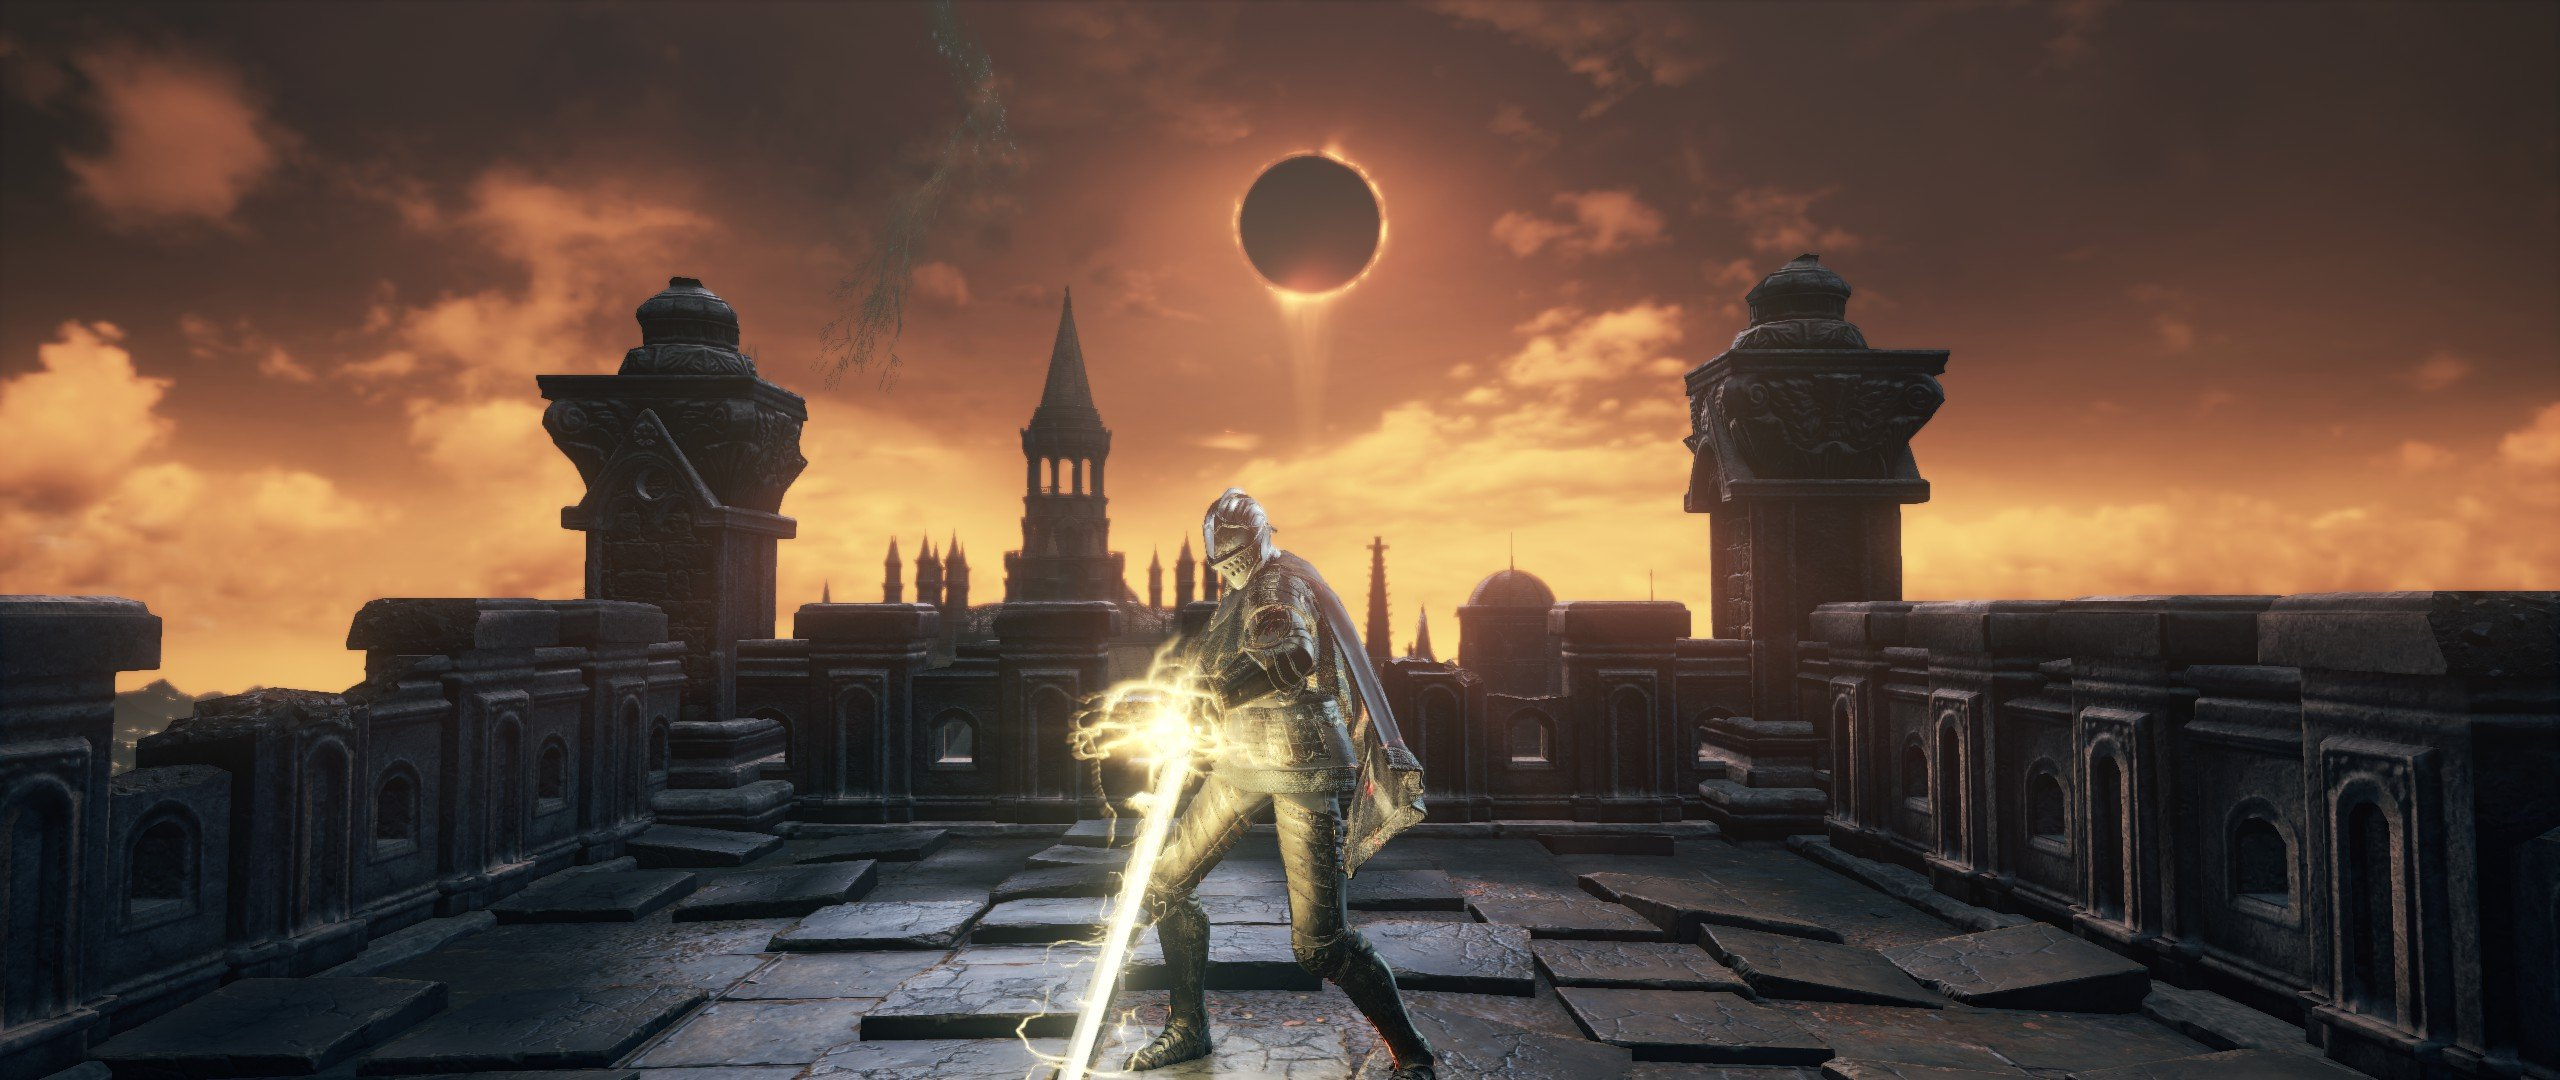 Visual Effect & Lightning Blade | Dark Souls 3 Wiki azcodes.com